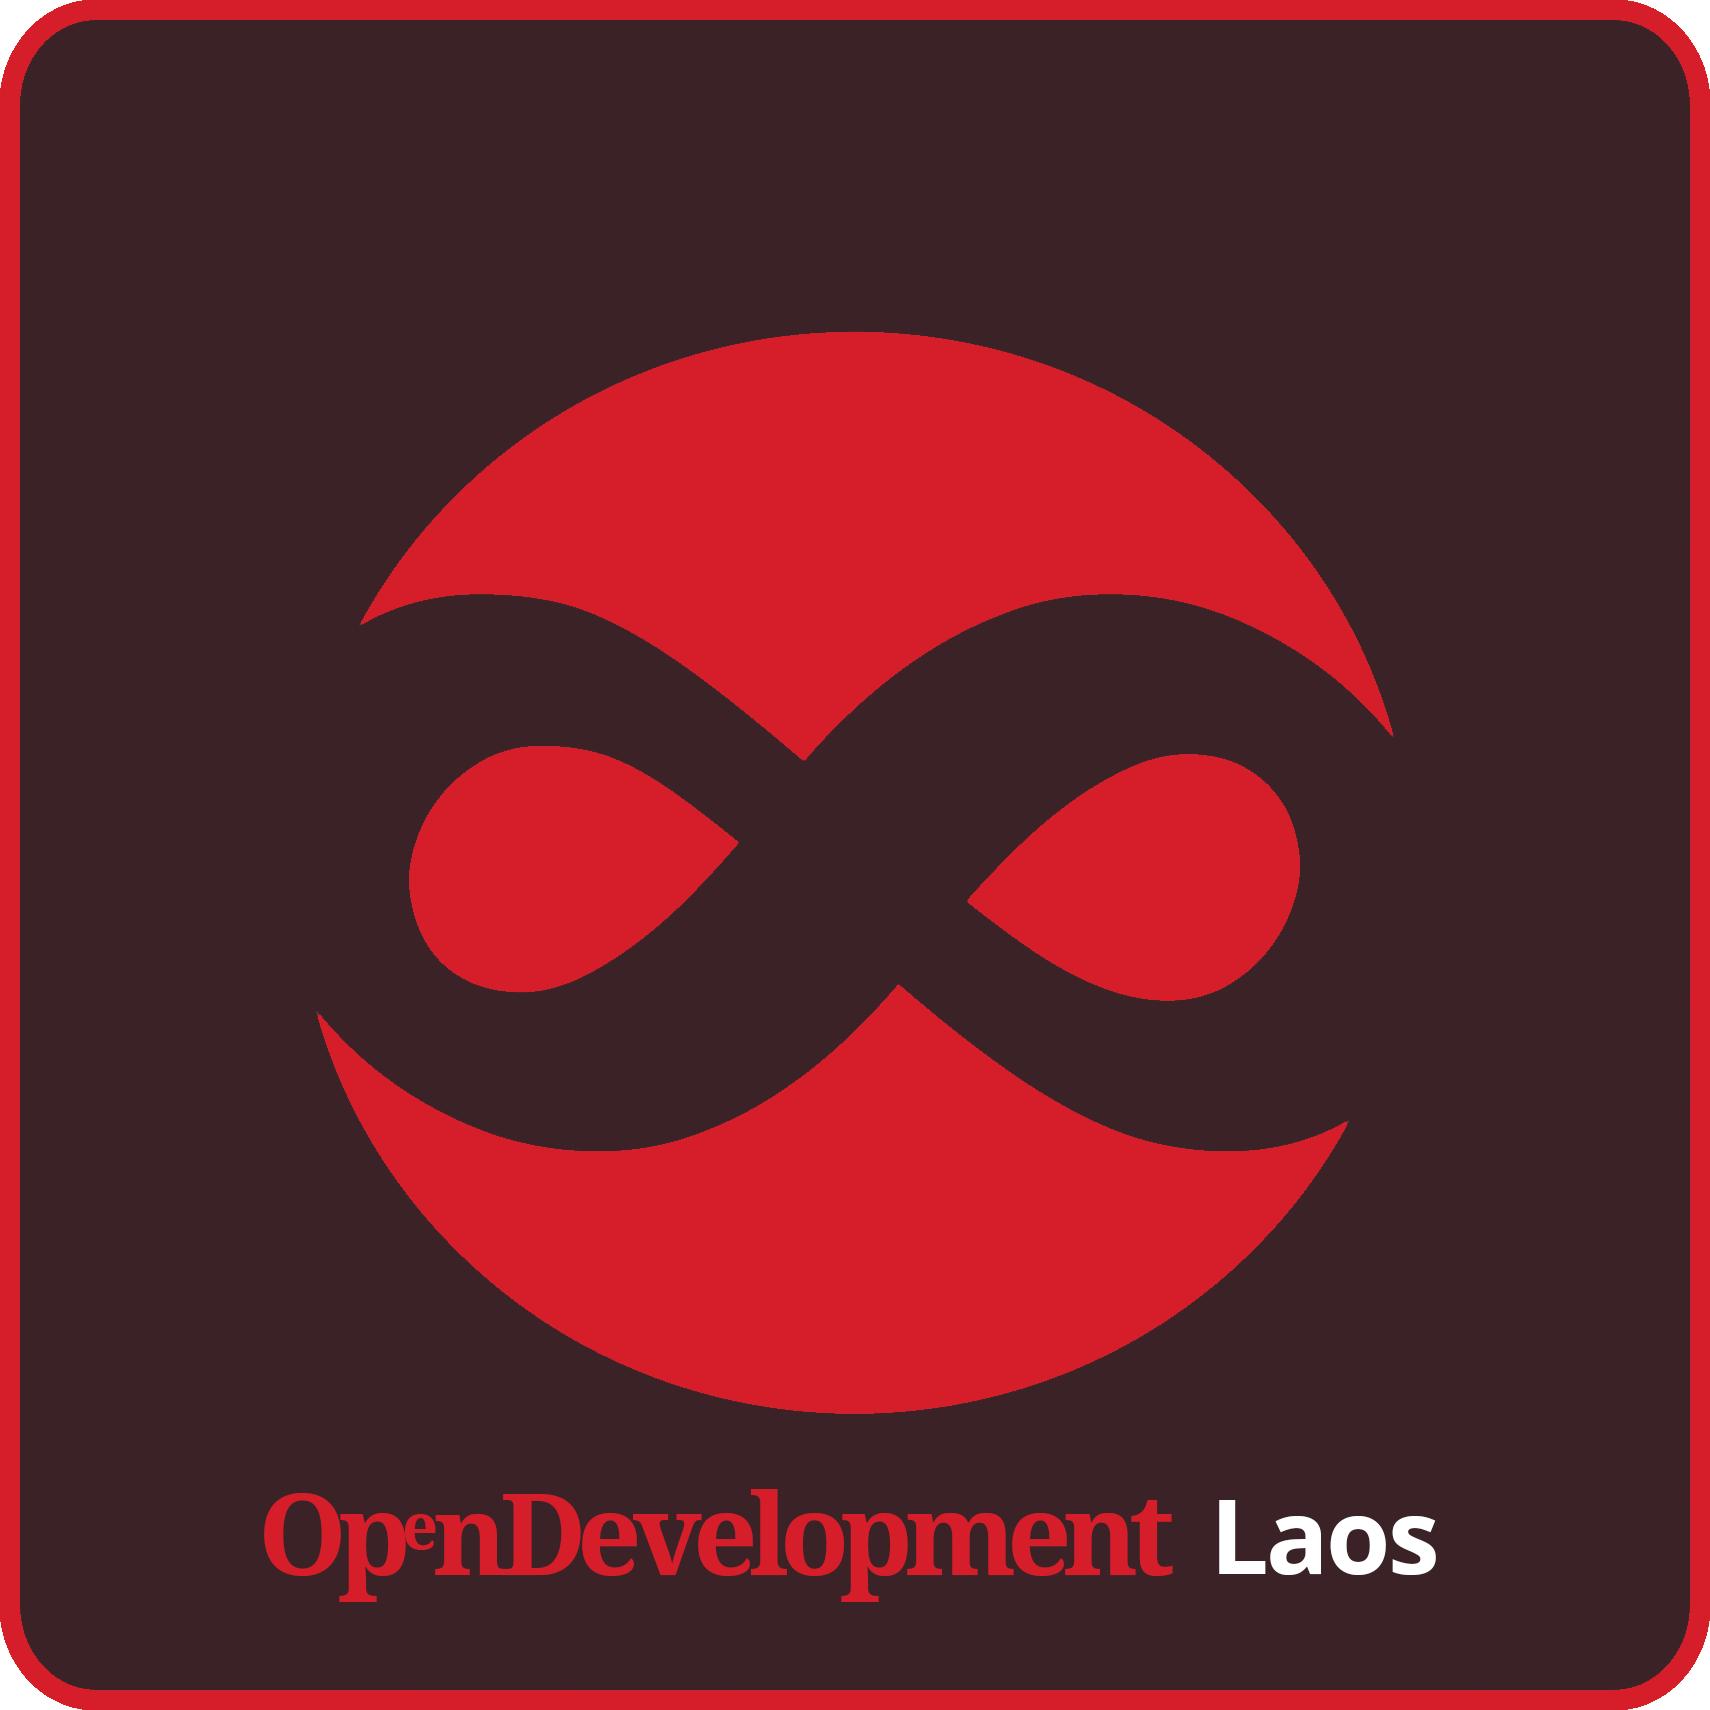 ODM-Laos-Logo_San-Serif